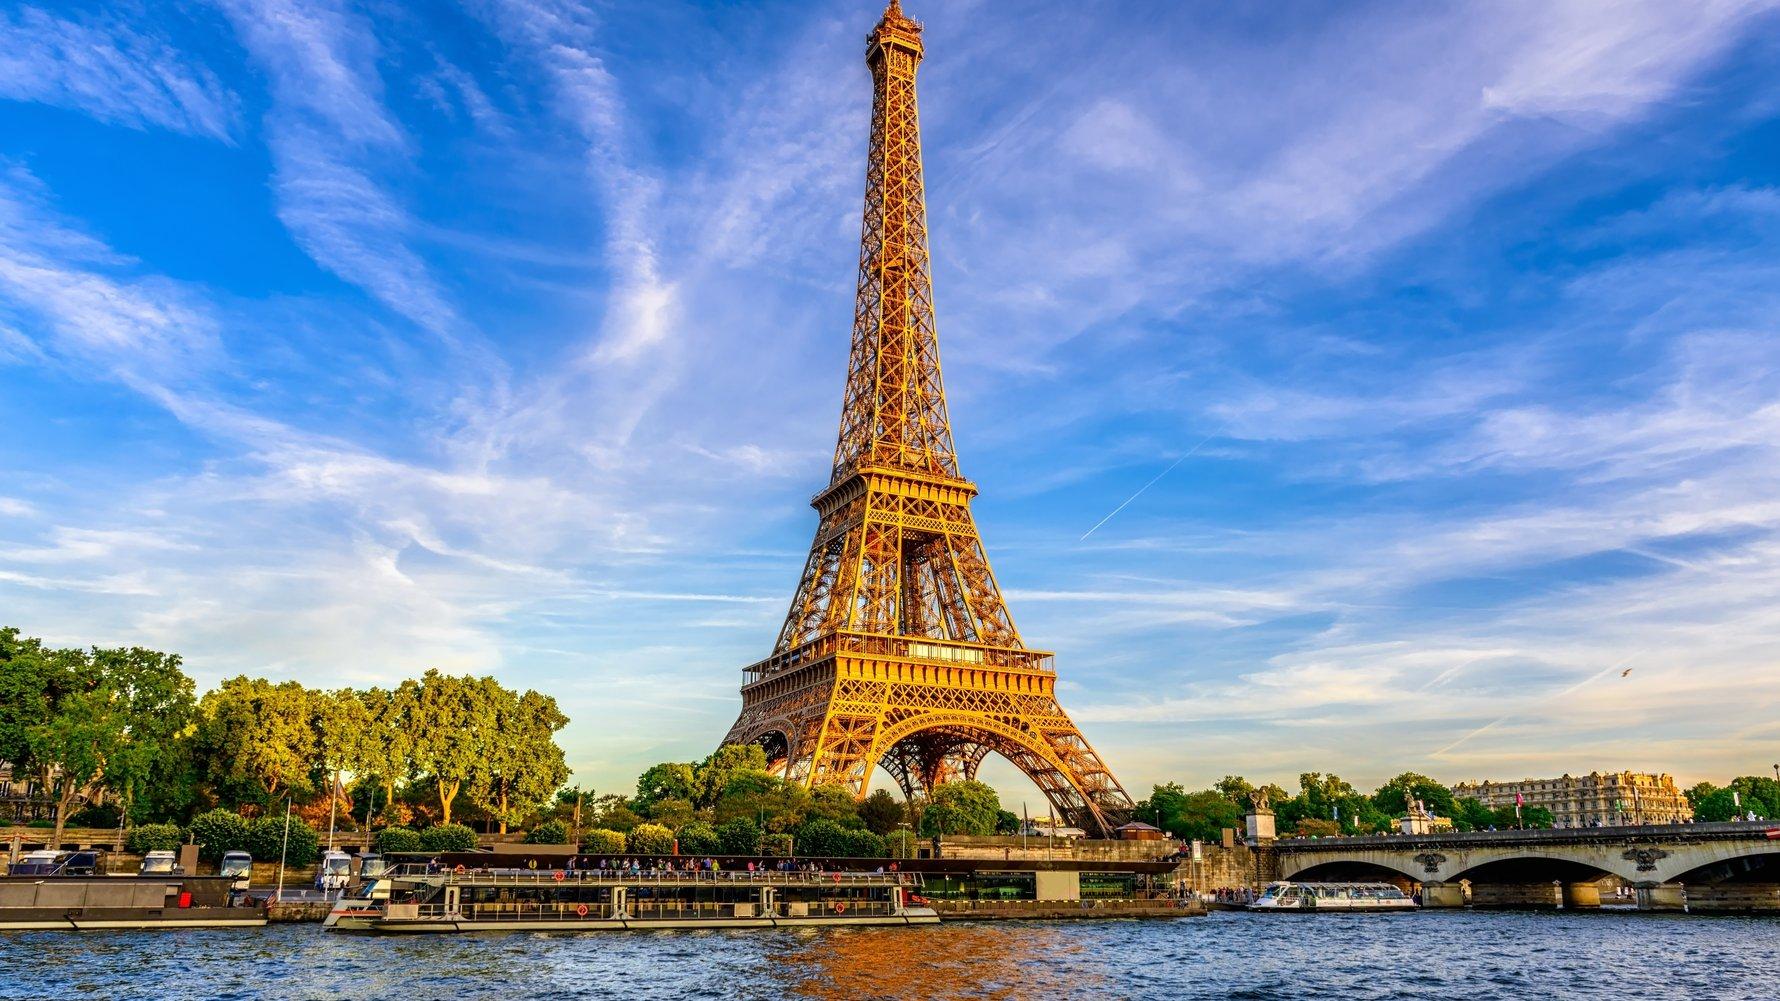 © Catarina Belova Shutterstock.com Paris Eiffel Tower and river Seine at sunset in Paris, France